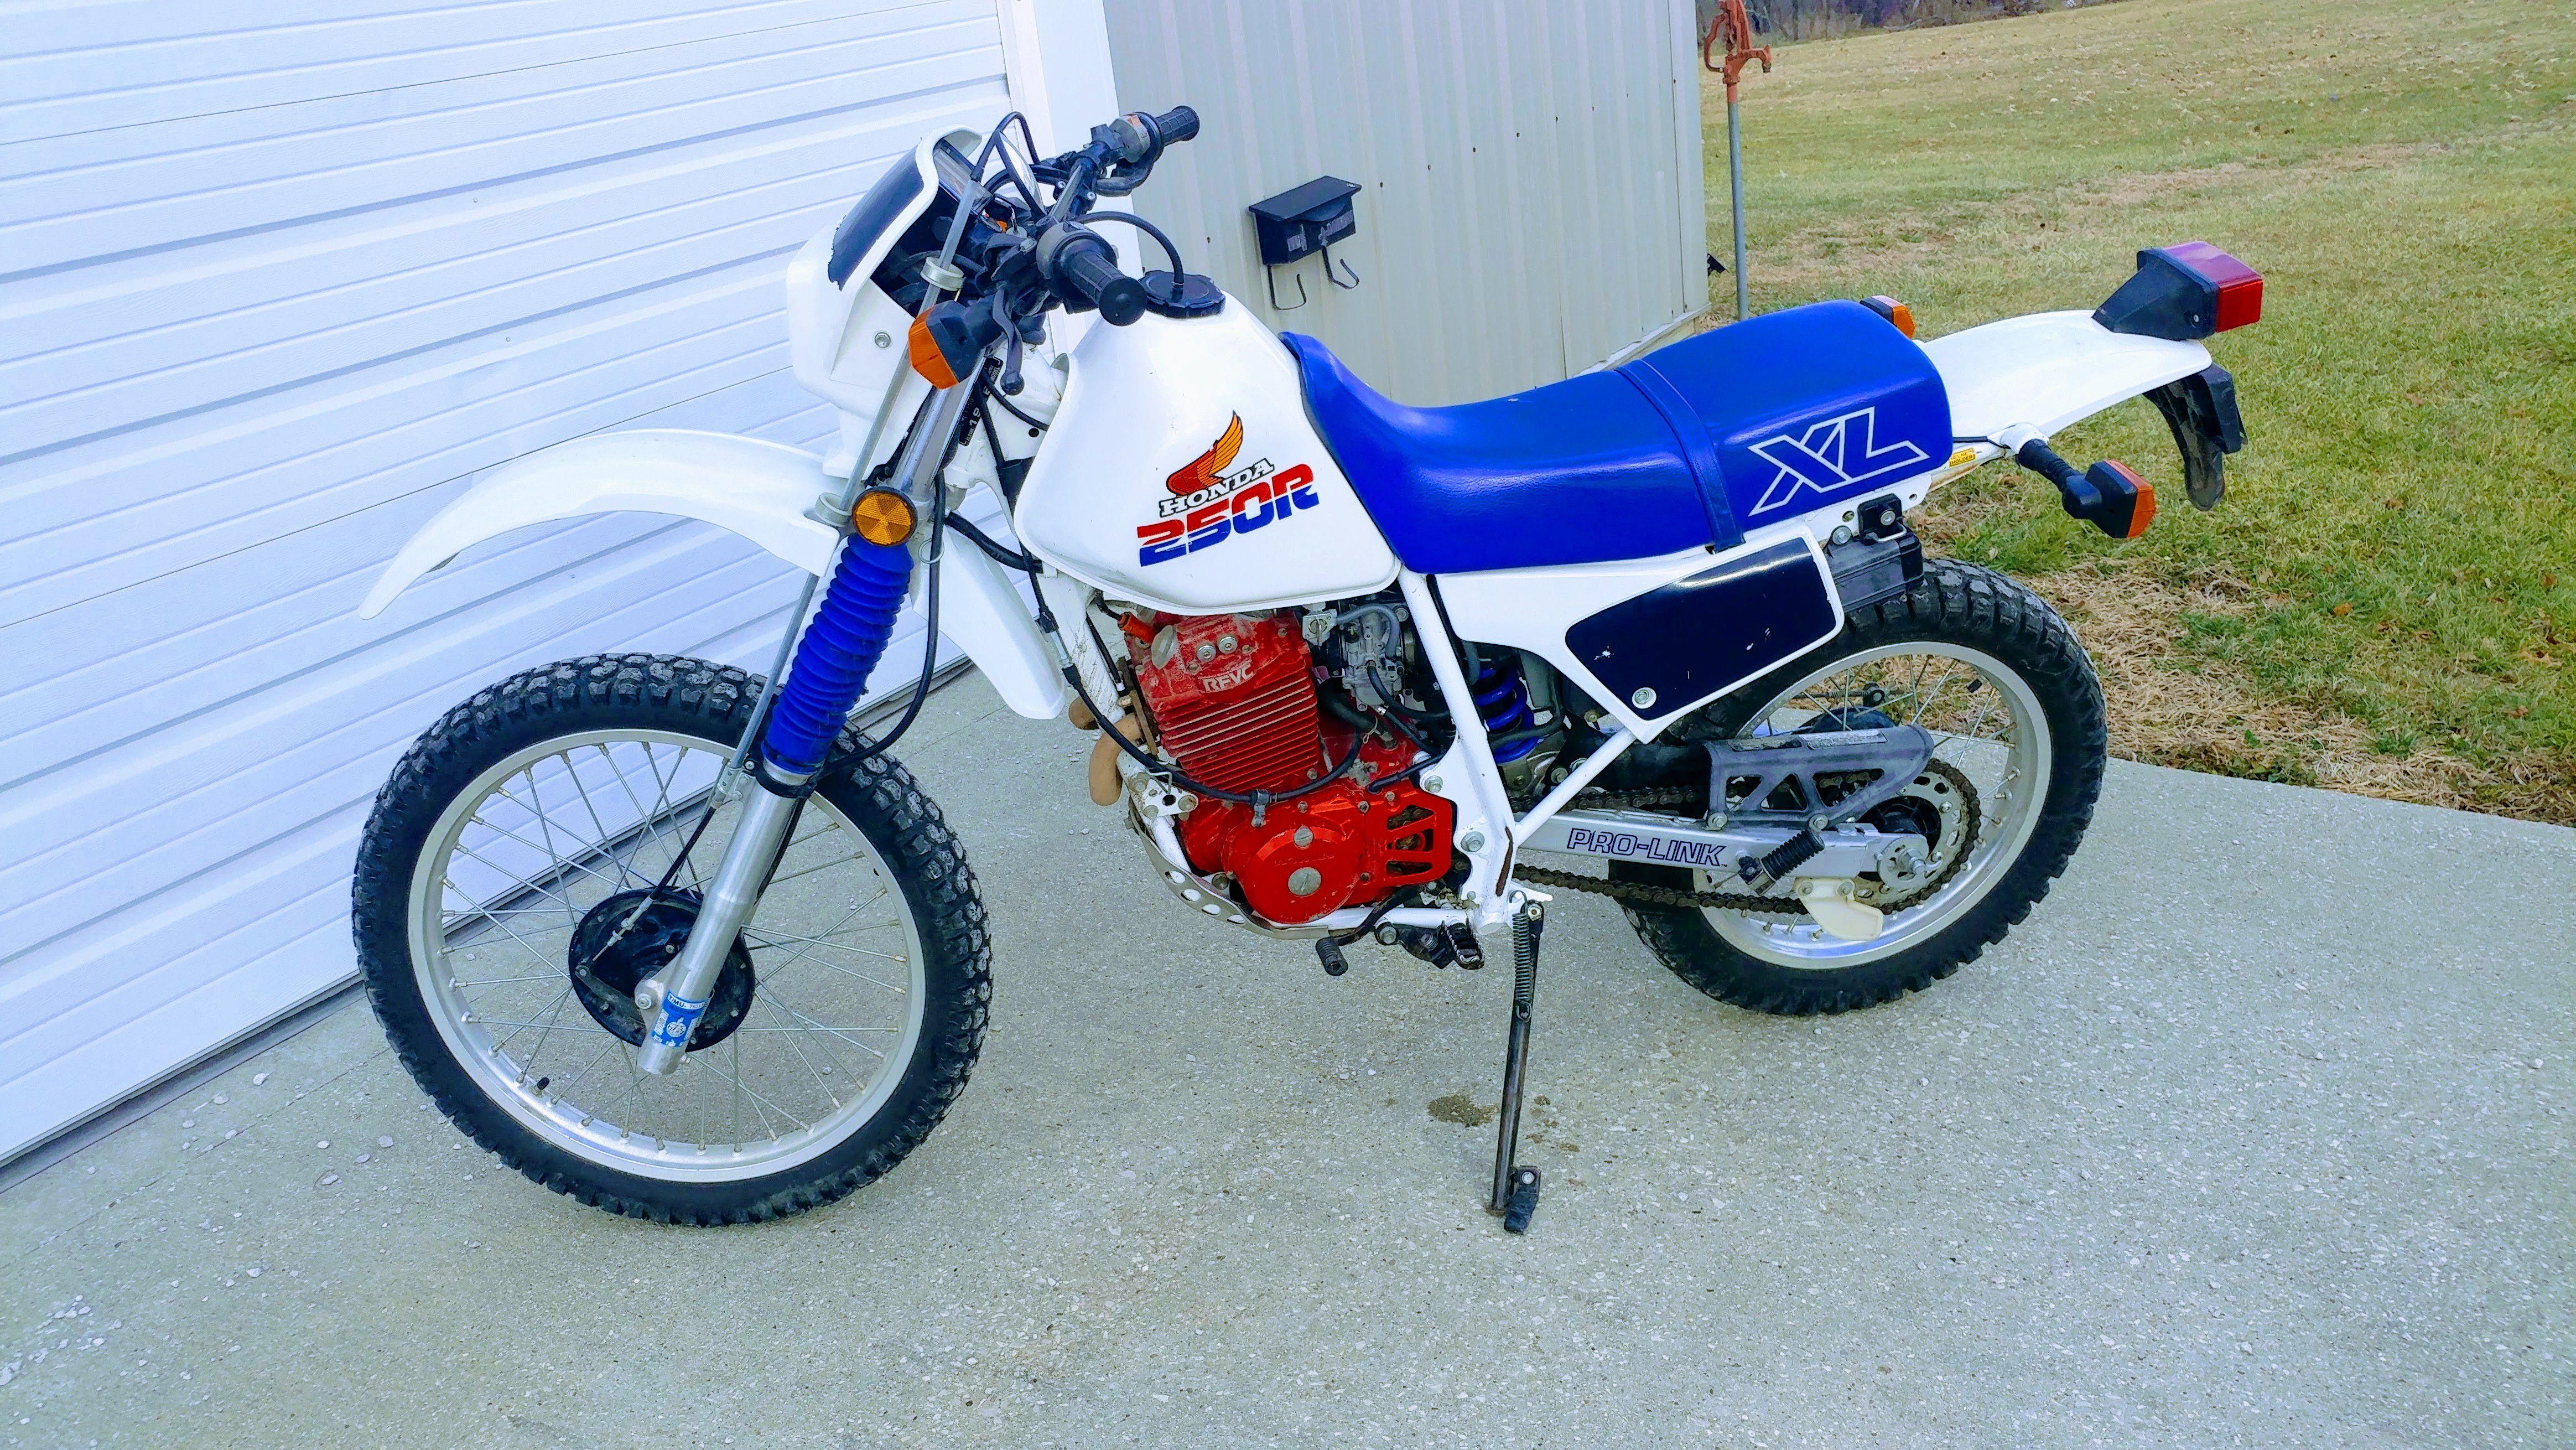 Honda XL 250 1986 image 1